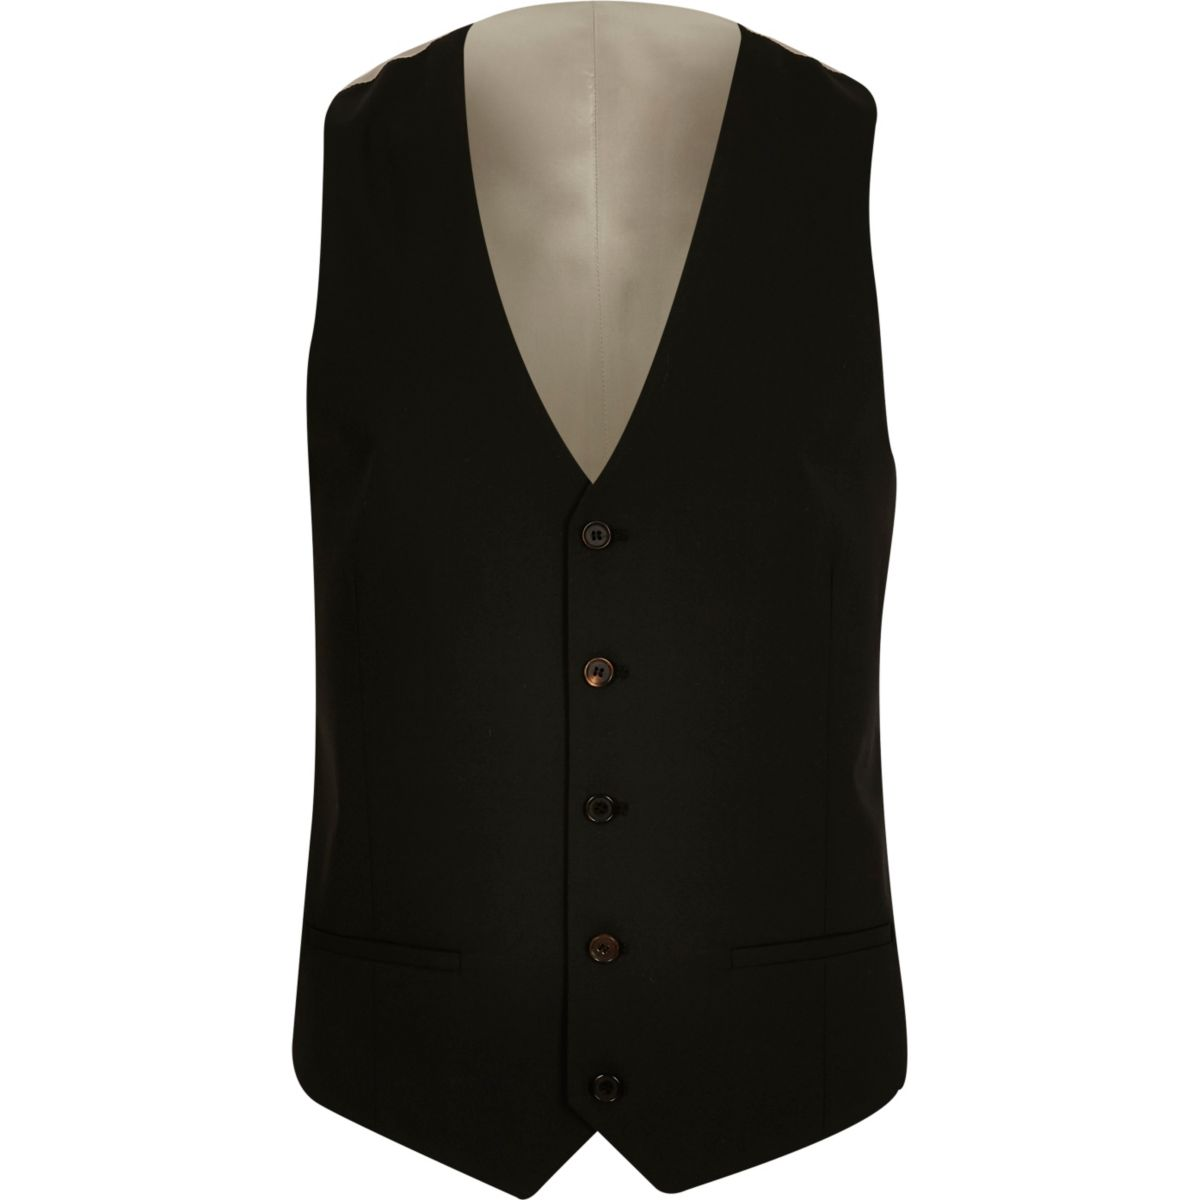 Black slim fit vest